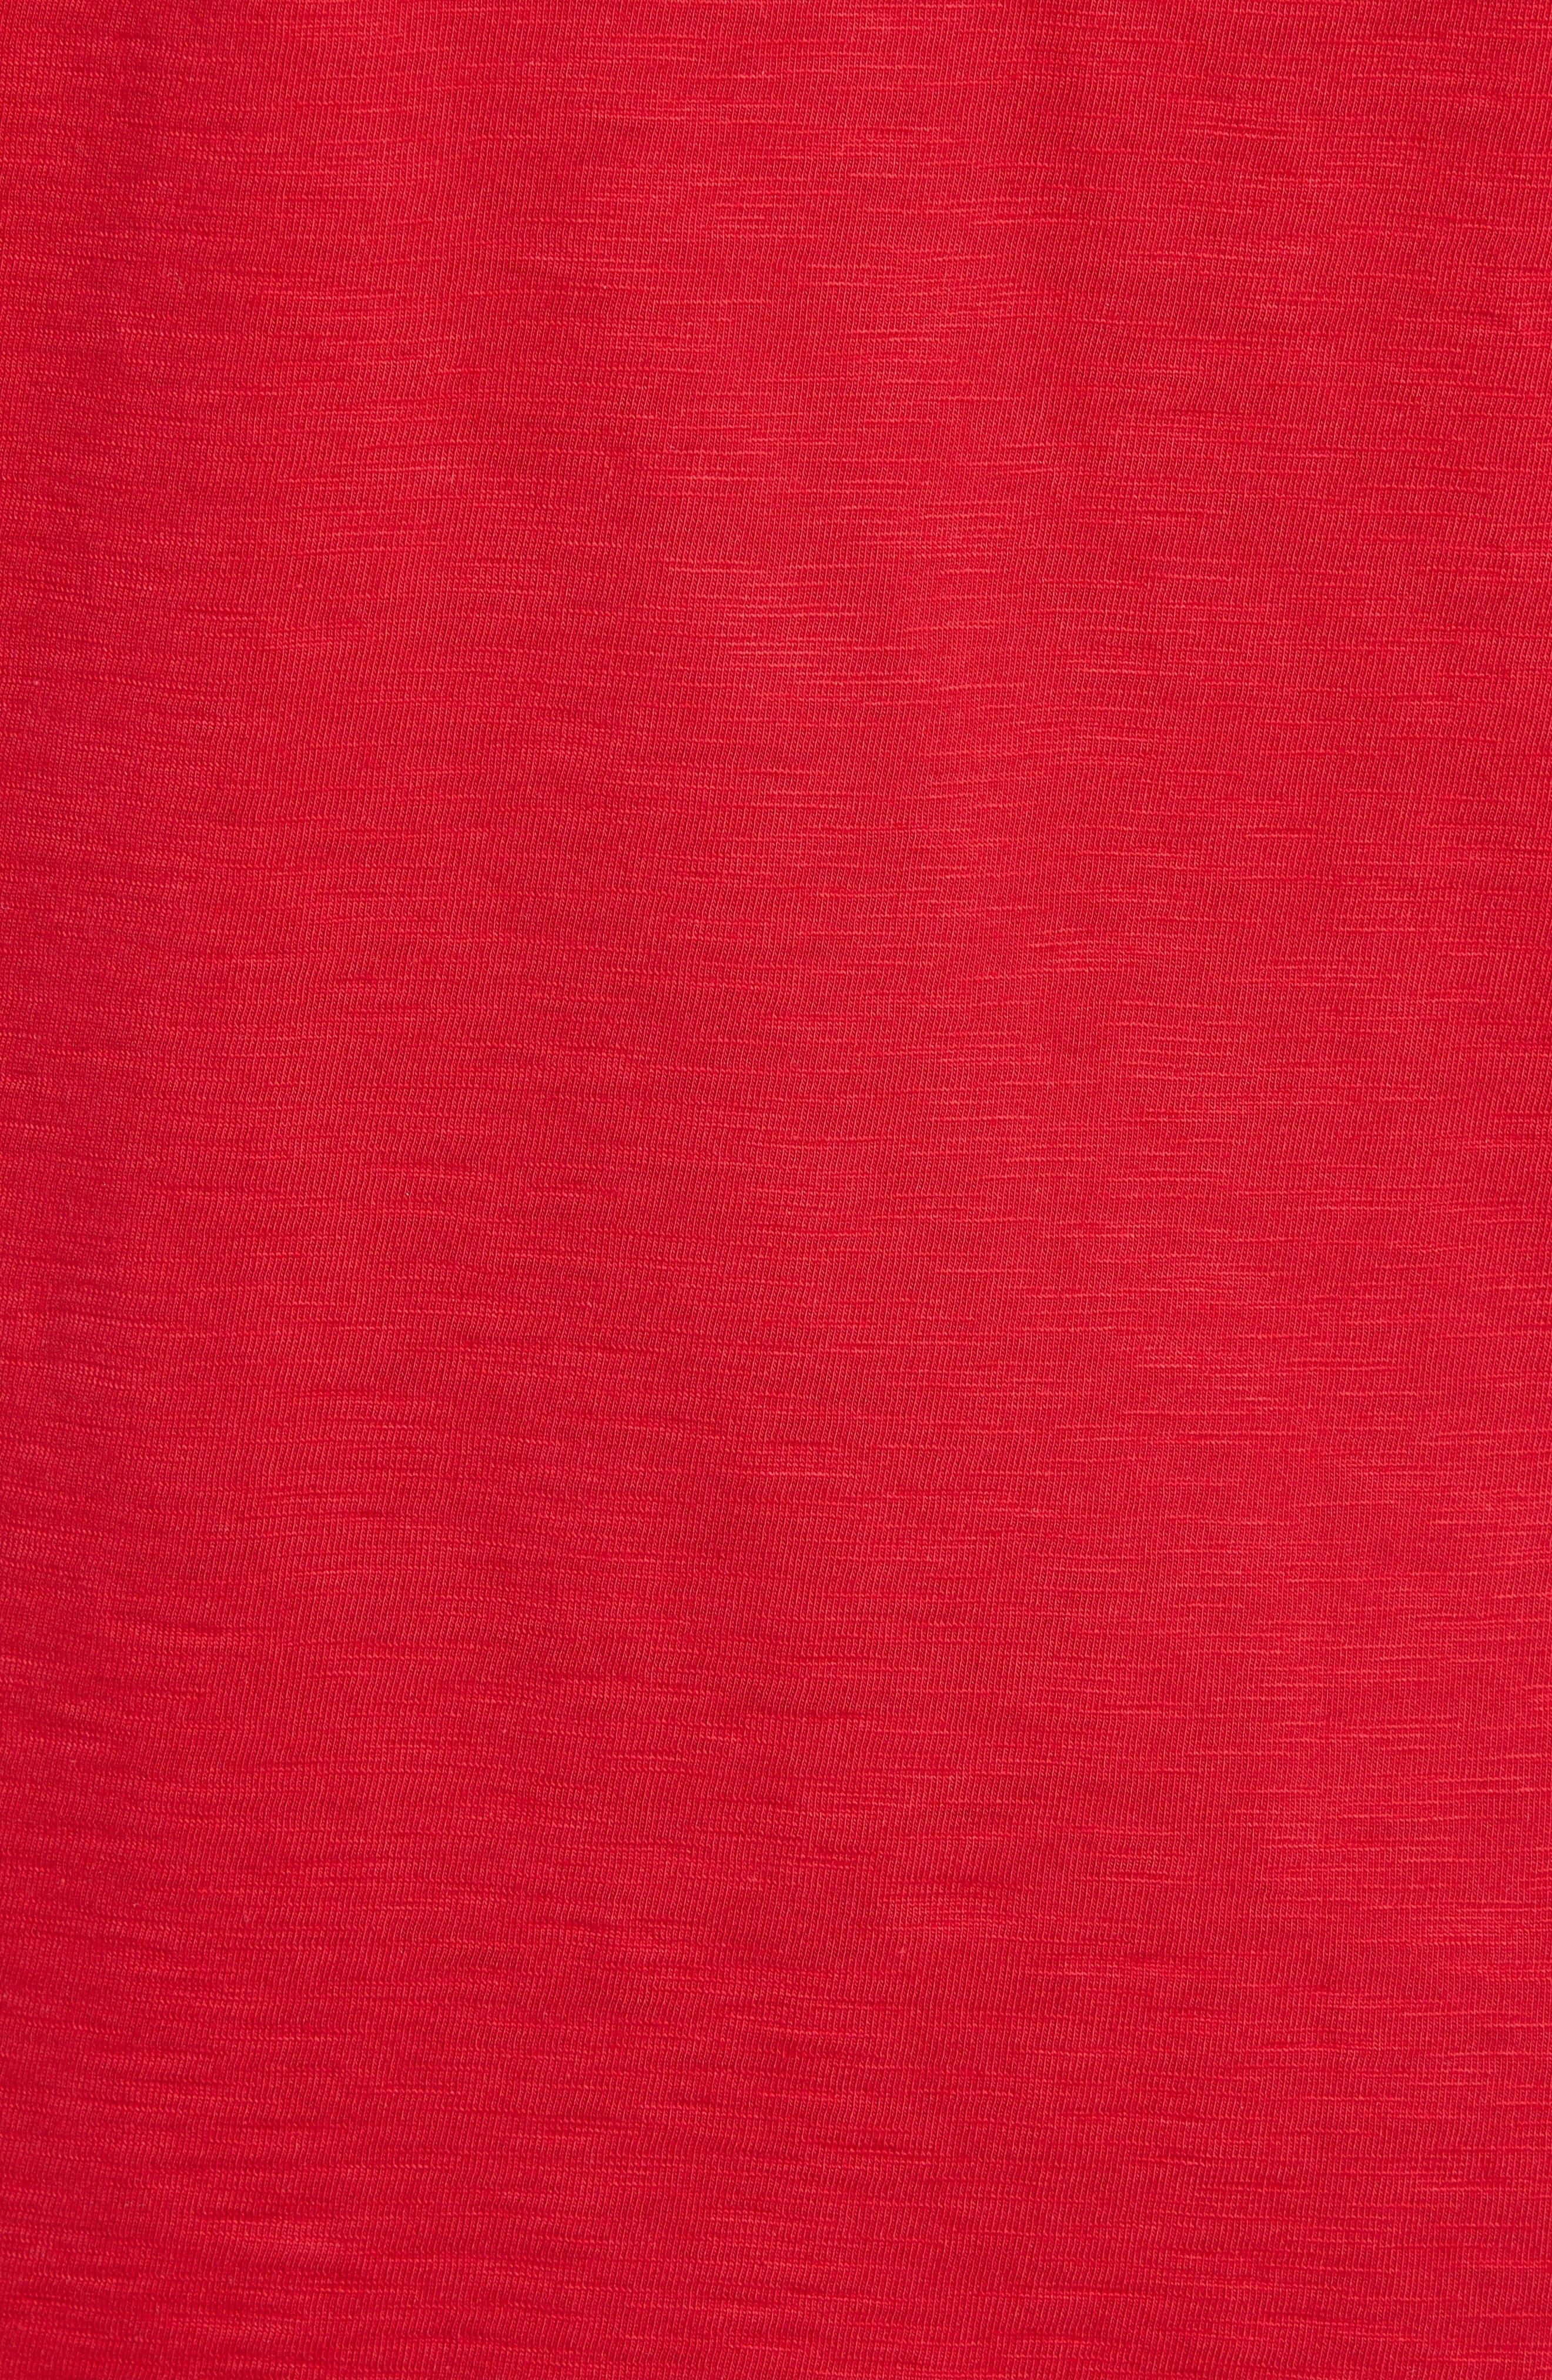 Mele Kalikimaka T-Shirt,                             Alternate thumbnail 5, color,                             SCOOTER RED